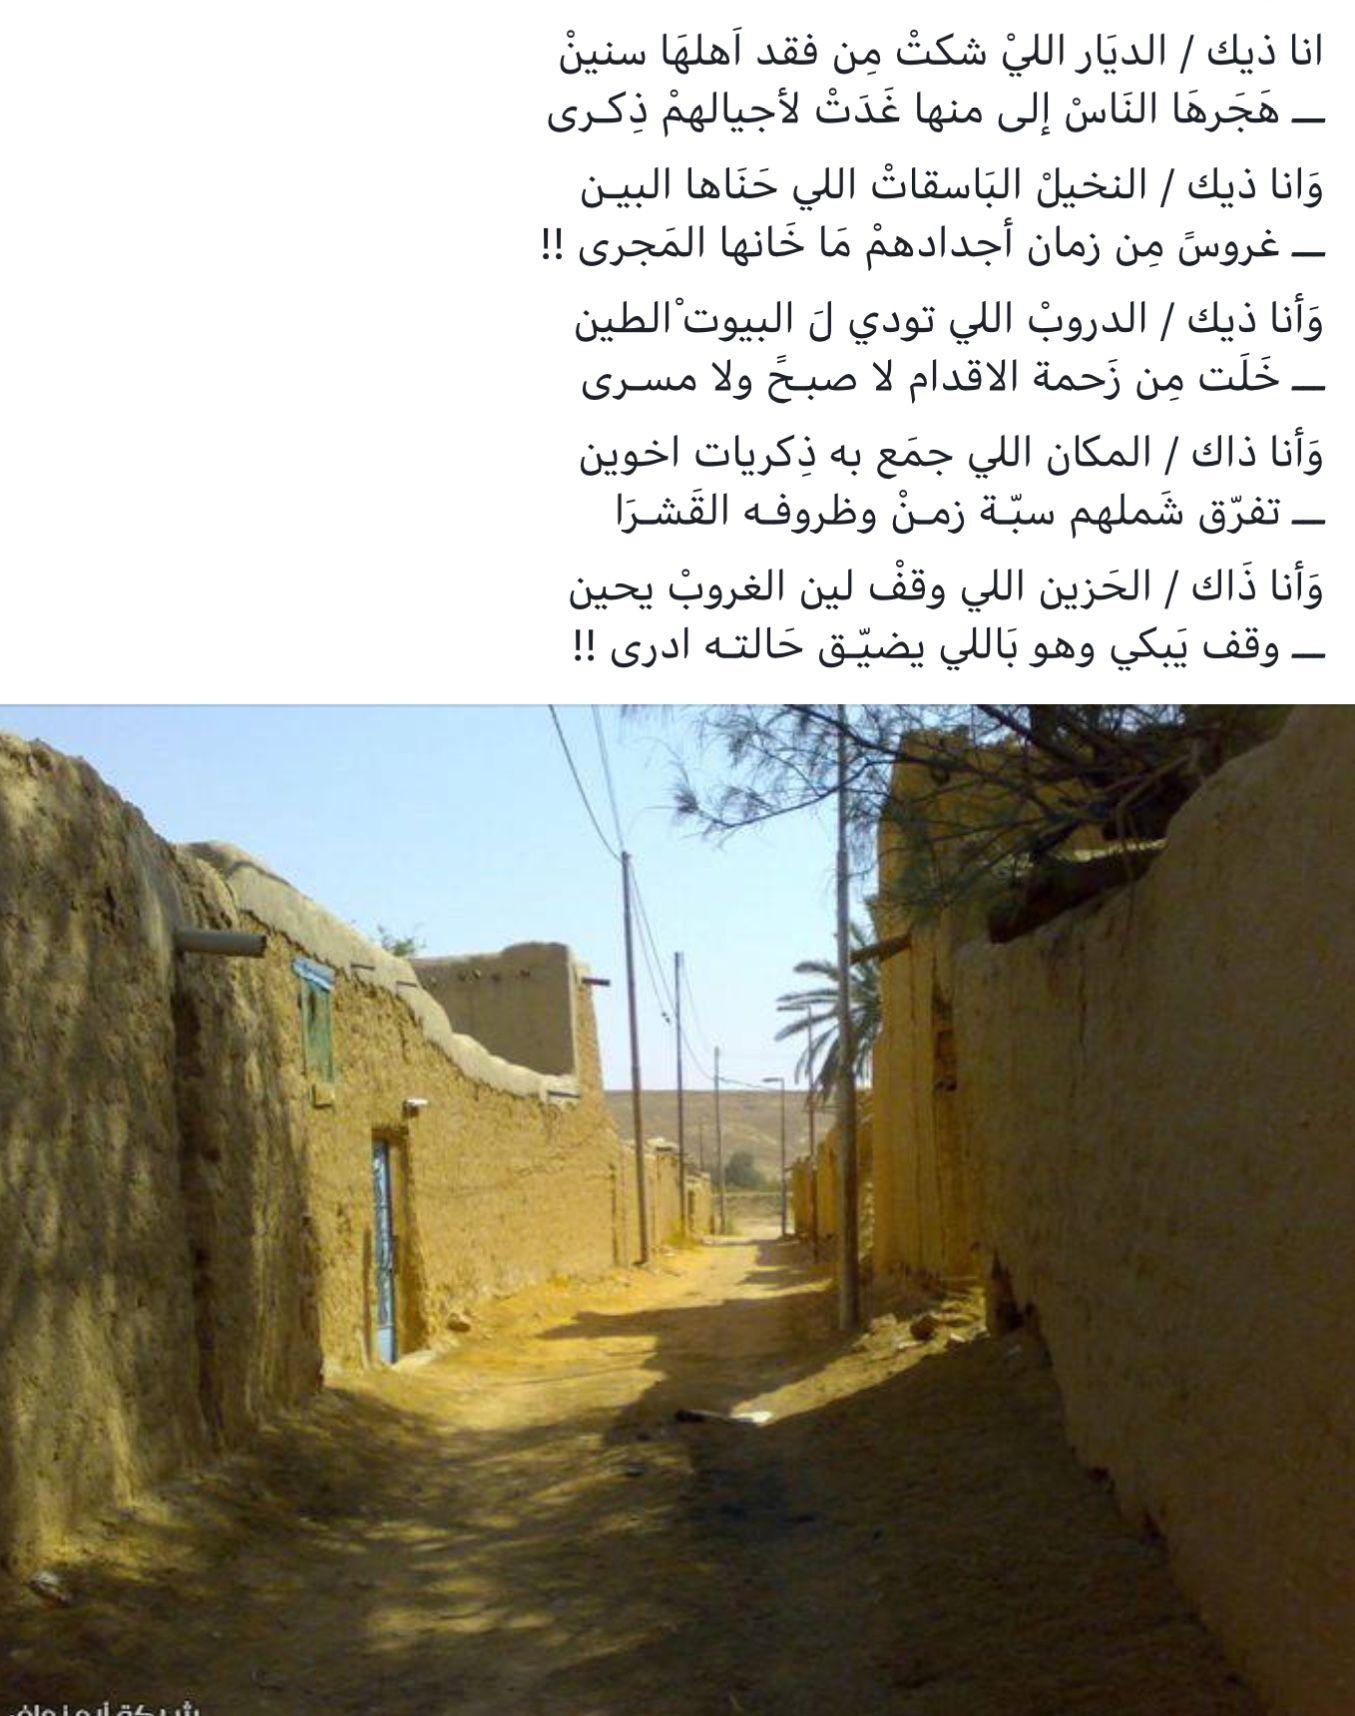 Pin By Nodmubarakfatima On Arabic Quotes In 2020 Natural Landmarks Landmarks Travel